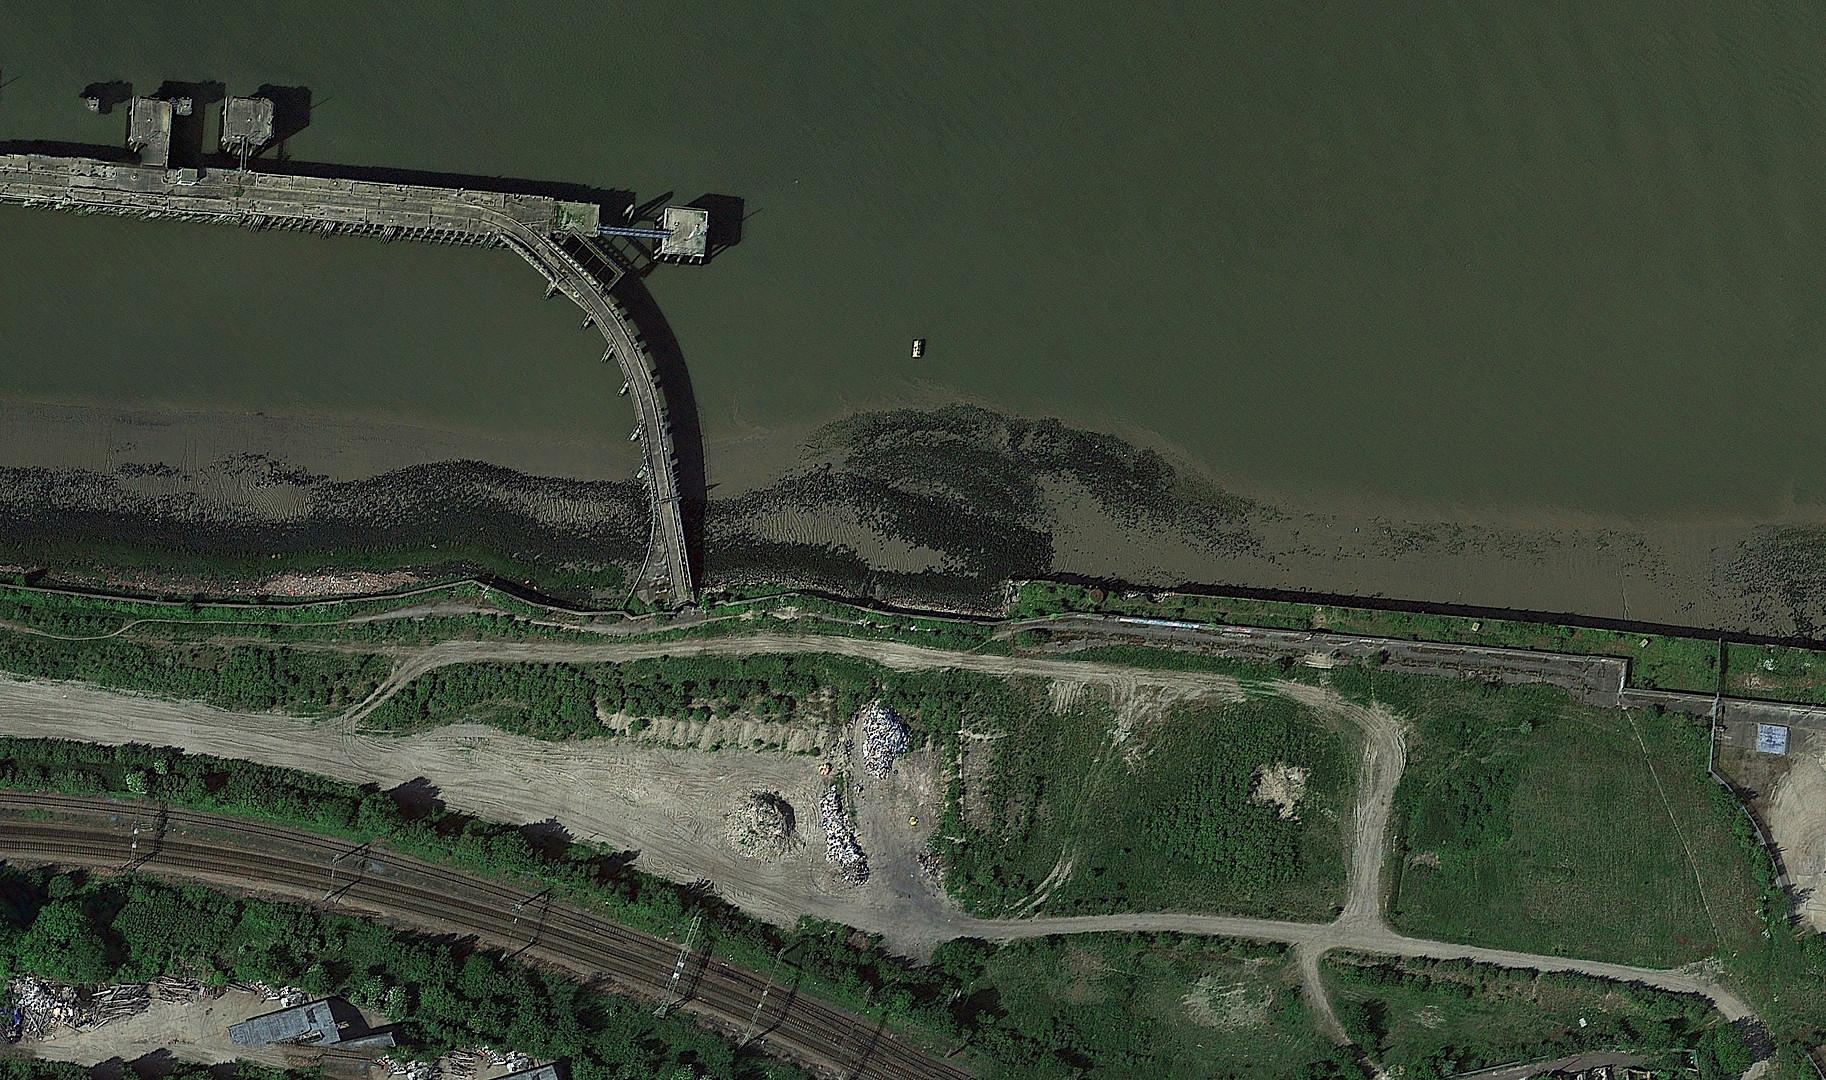 Aerial view of River Thames near Rainham, London.